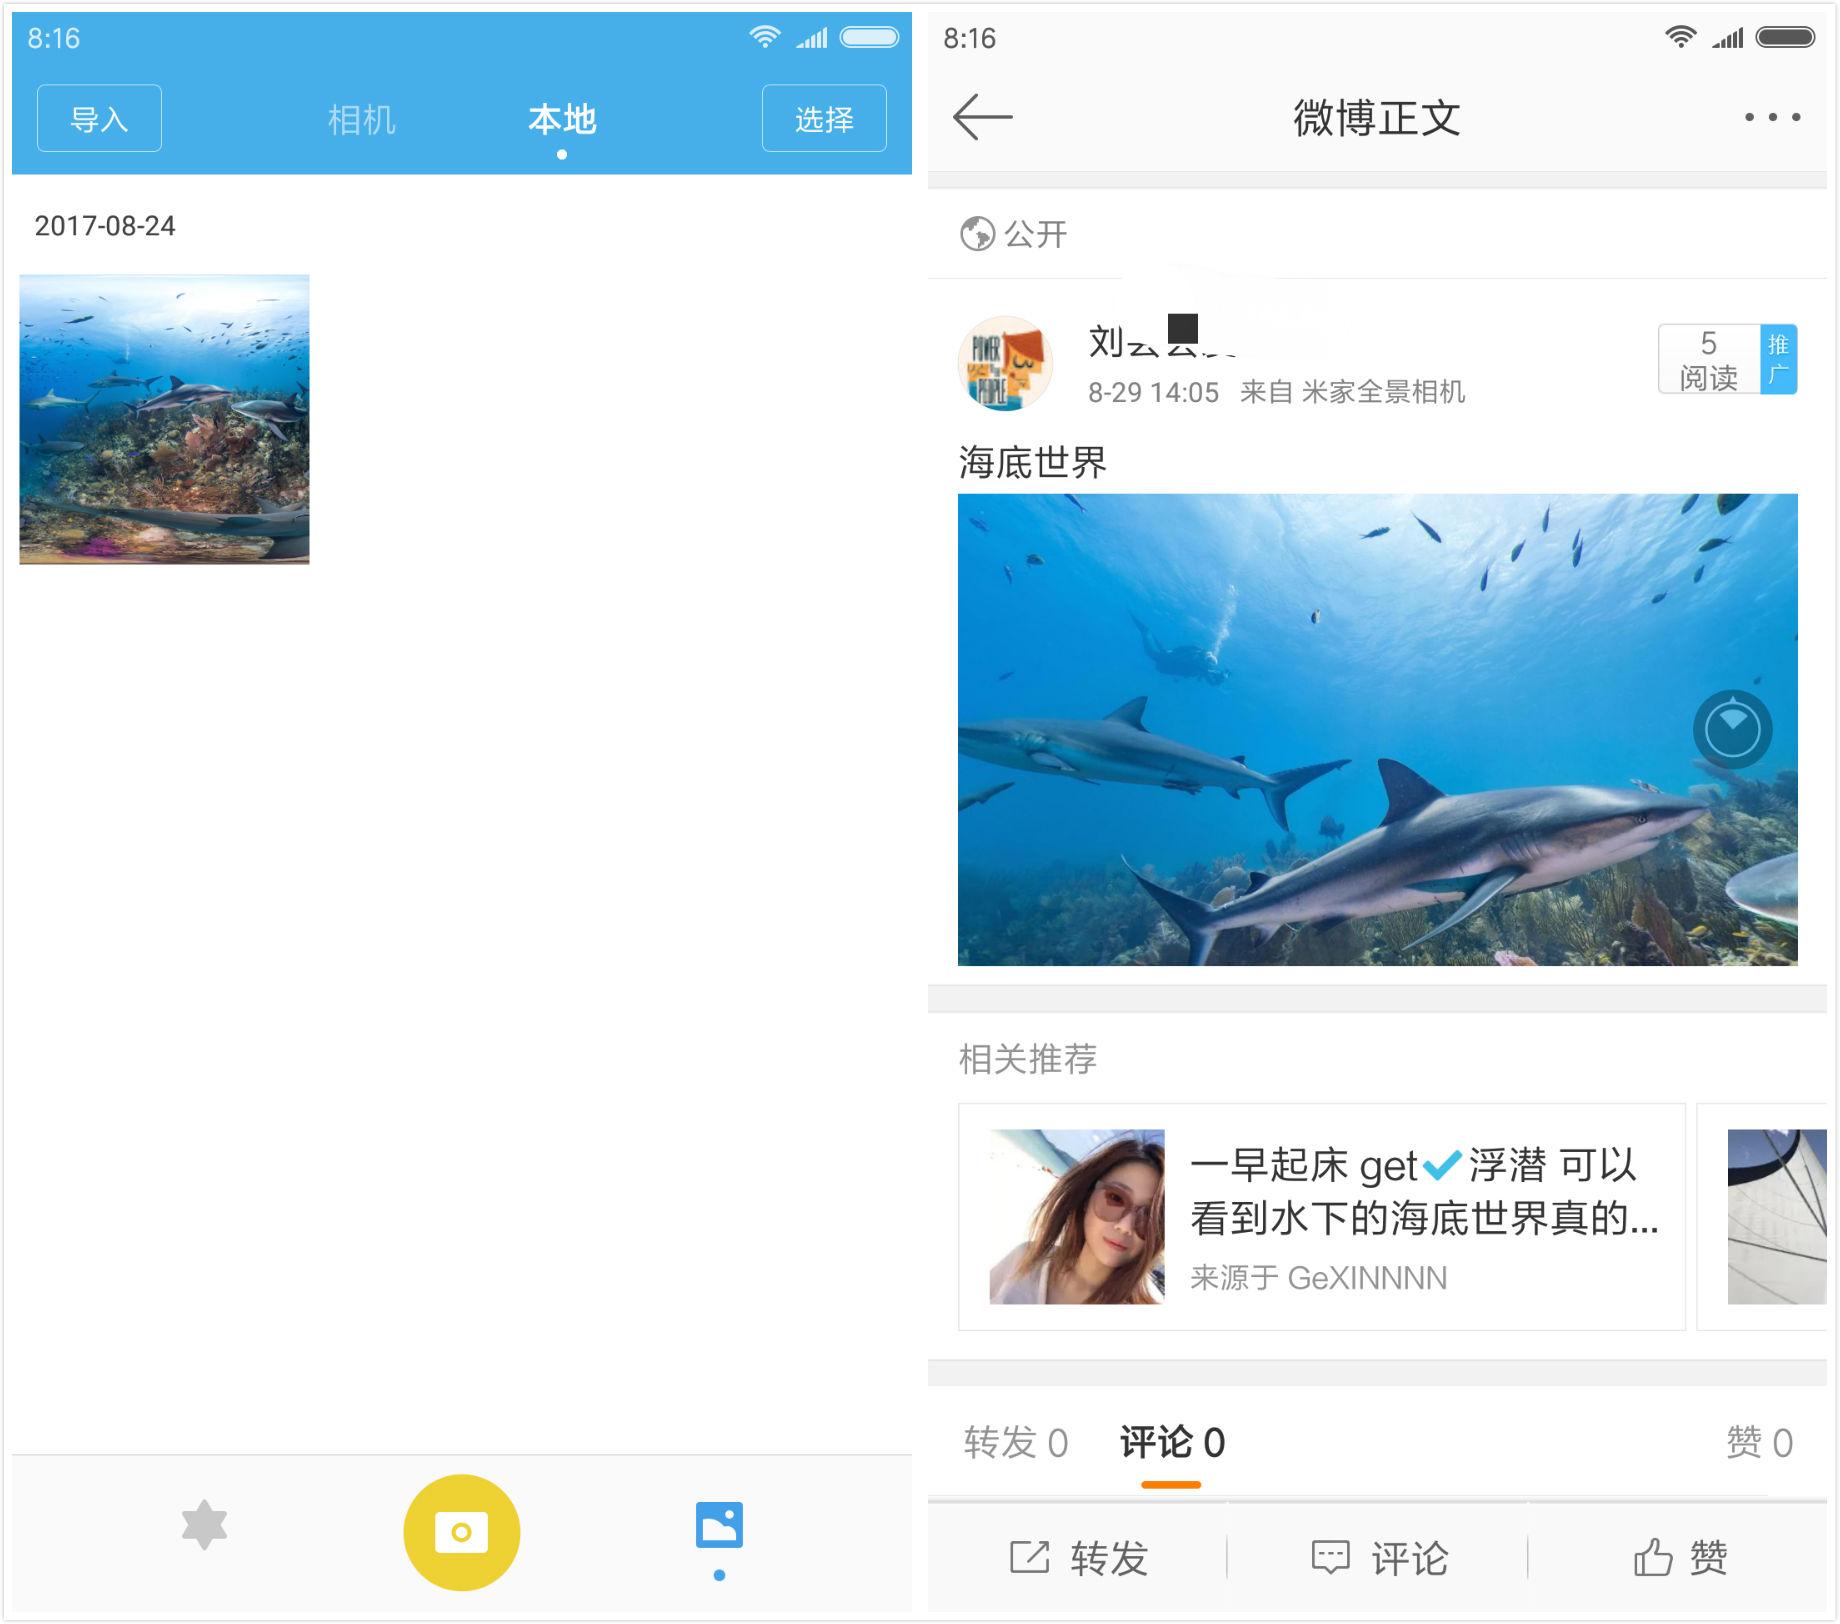 Screenshot_2017-08-29-13-57-25-003_com.sina.weibo_meitu_3.jpg